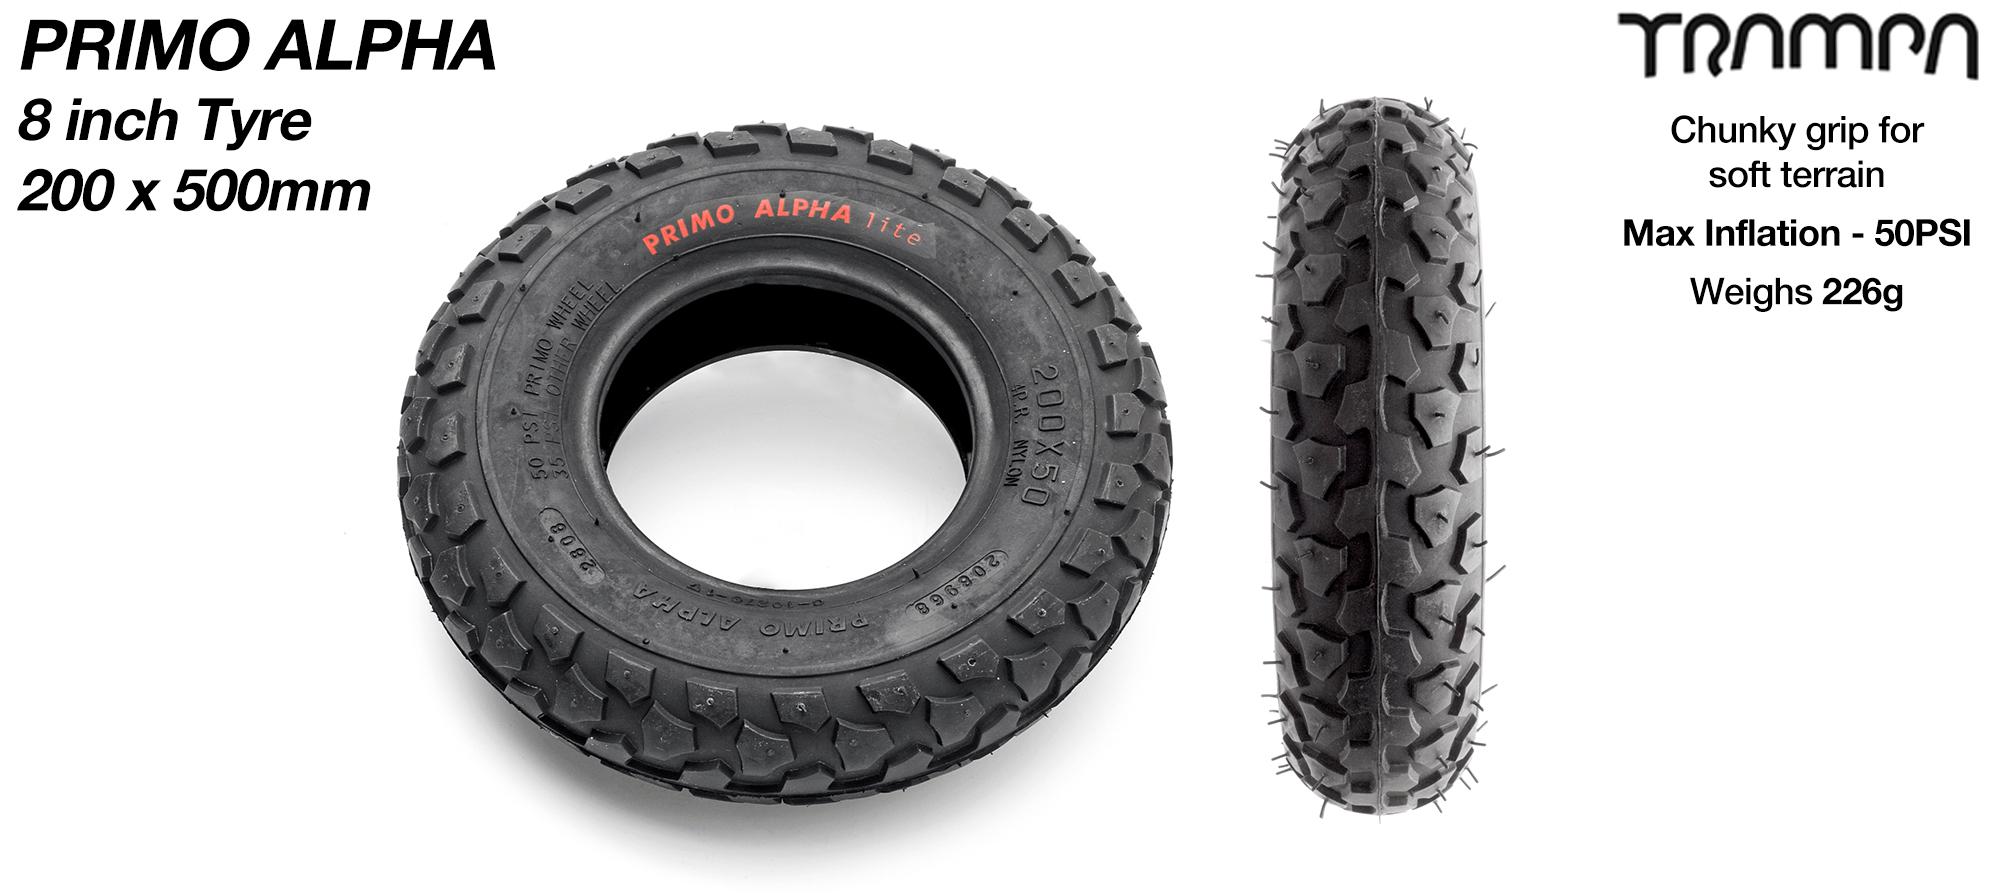 PRIMO ALPHA - Premium 8 Inch All purpose Dirt Tyres